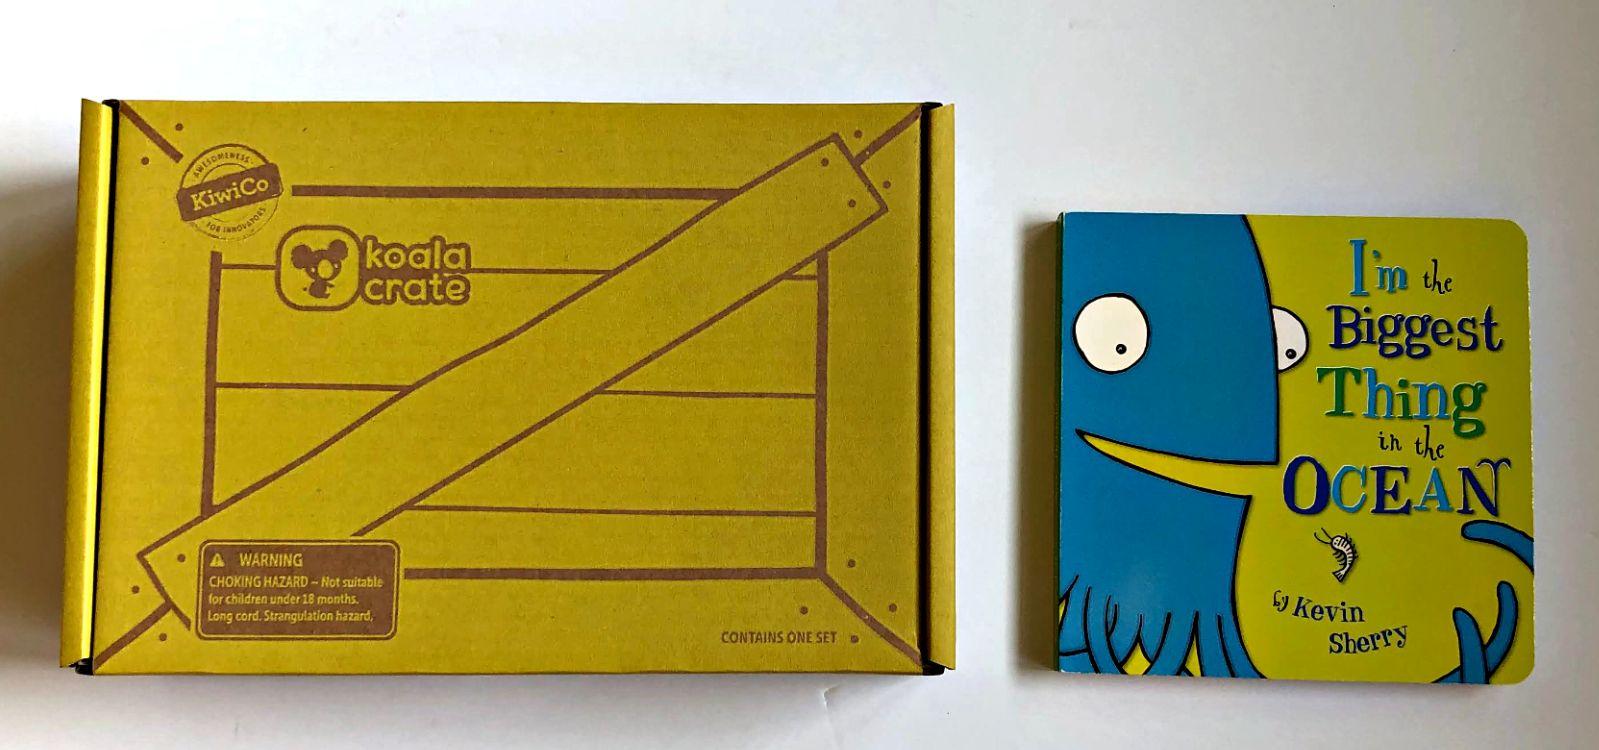 Koala Crate Box